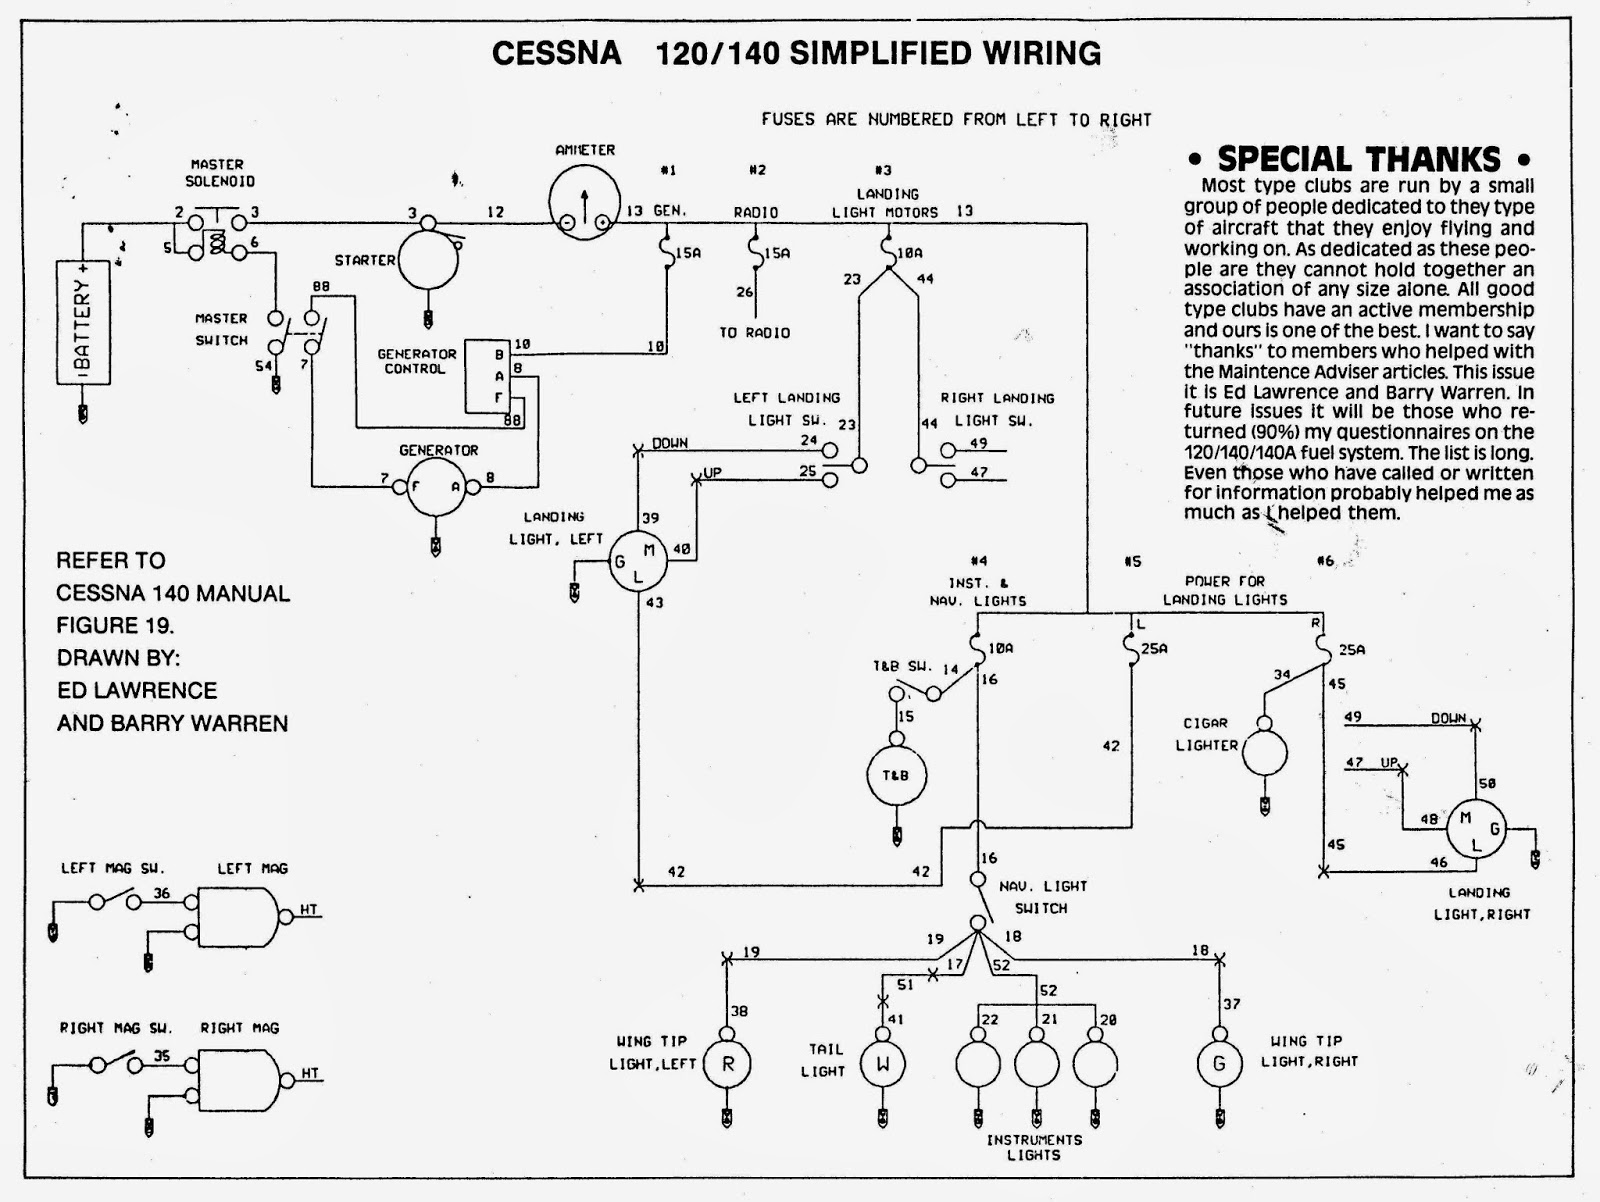 [DIAGRAM_4PO]  FE_4840] Cessna 152 Alternator Wiring Diagram Cessna 150 Alternator Wiring | Cessna Alternator Wiring Schematic |  | Lectu Bedr Sapebe Mohammedshrine Librar Wiring 101